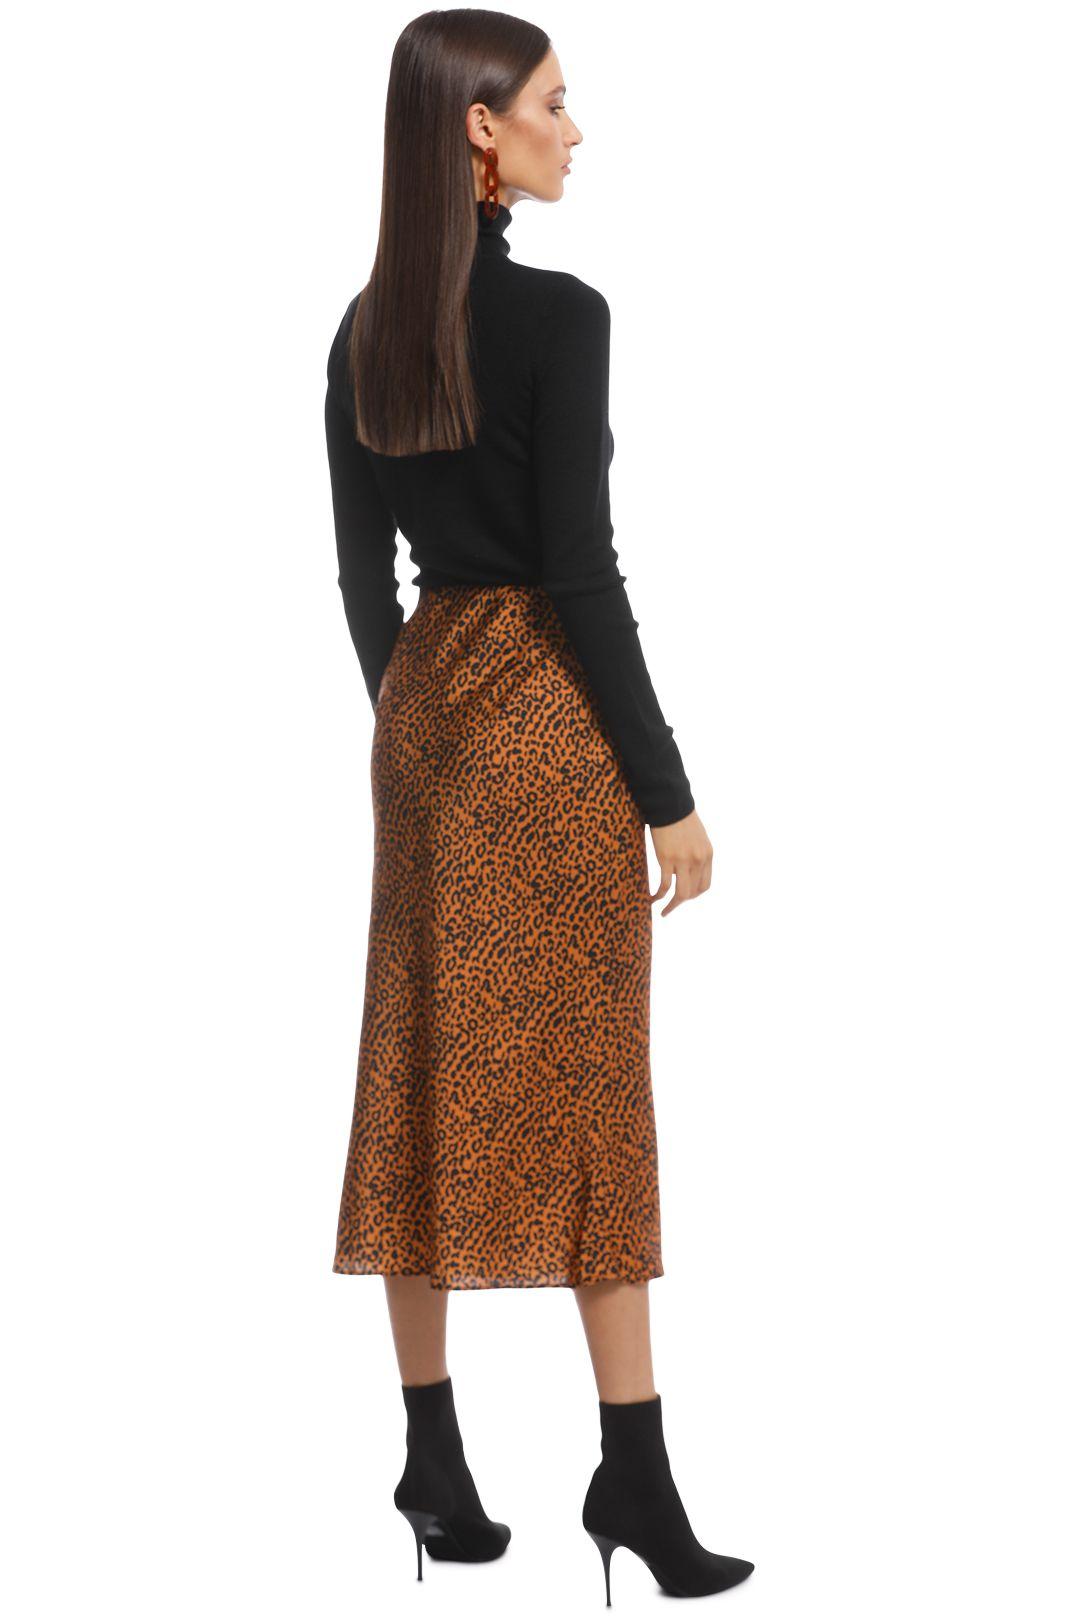 The East Order - Sahara Midi Skirt - Animal - Back